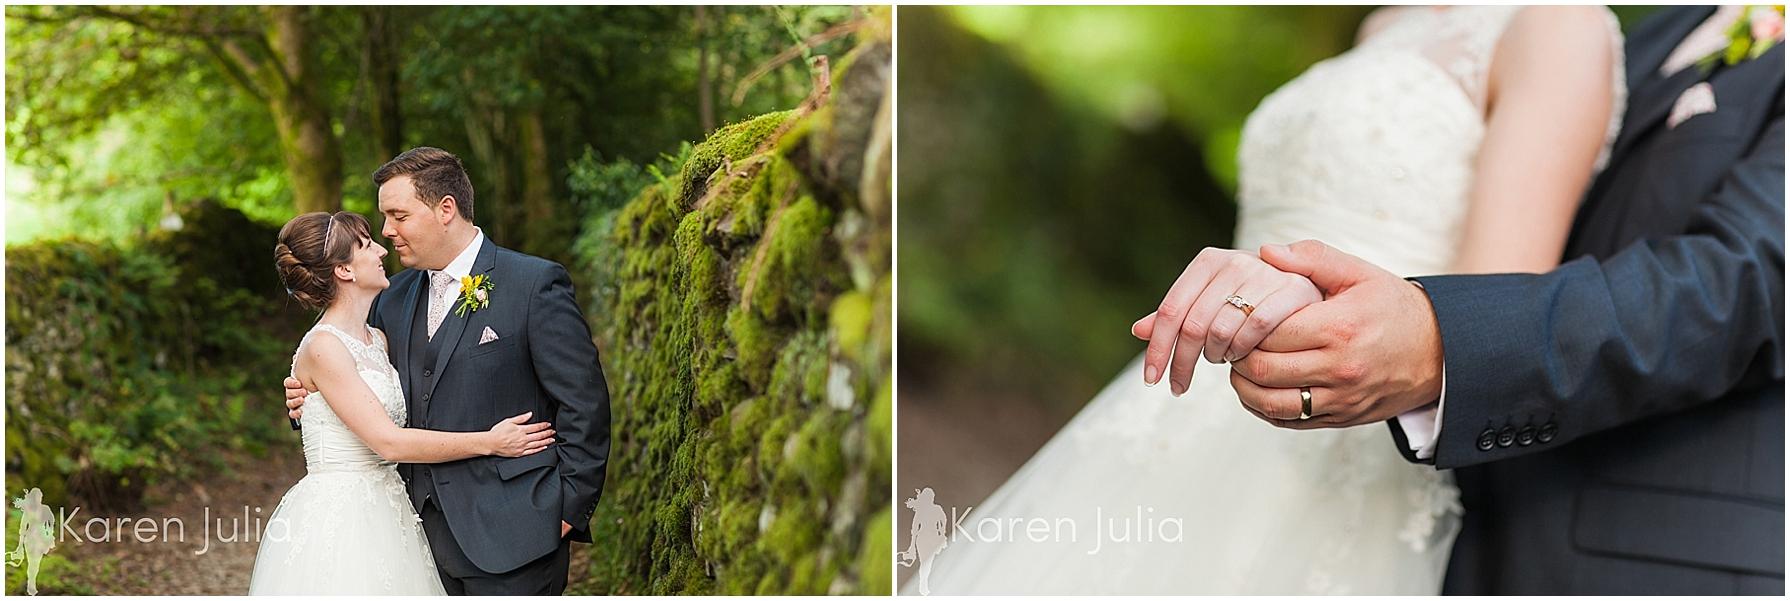 Miller-Howe-Hotel-Summer-Wedding-Photography-23